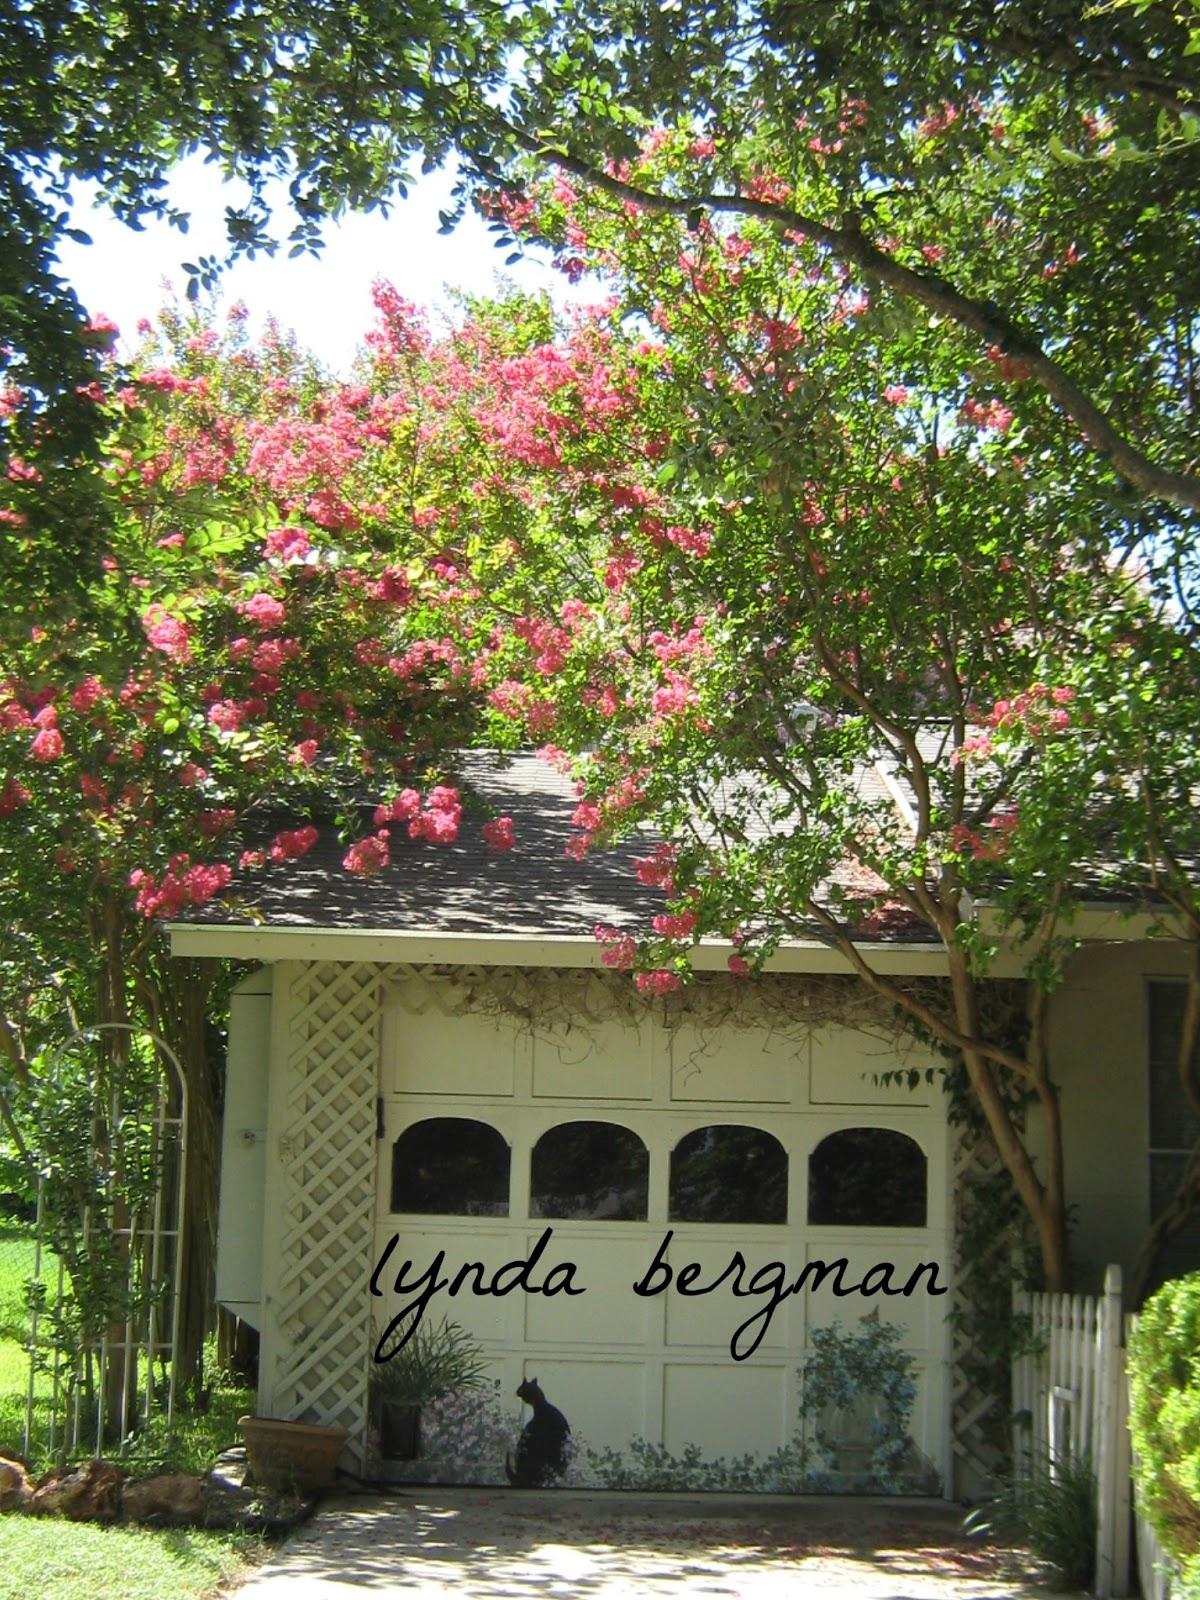 LYNDA BERGMAN DECORATIVE ARTISAN: LUCKY ME!! BEAUTIFUL CREPE MYRTLE ...